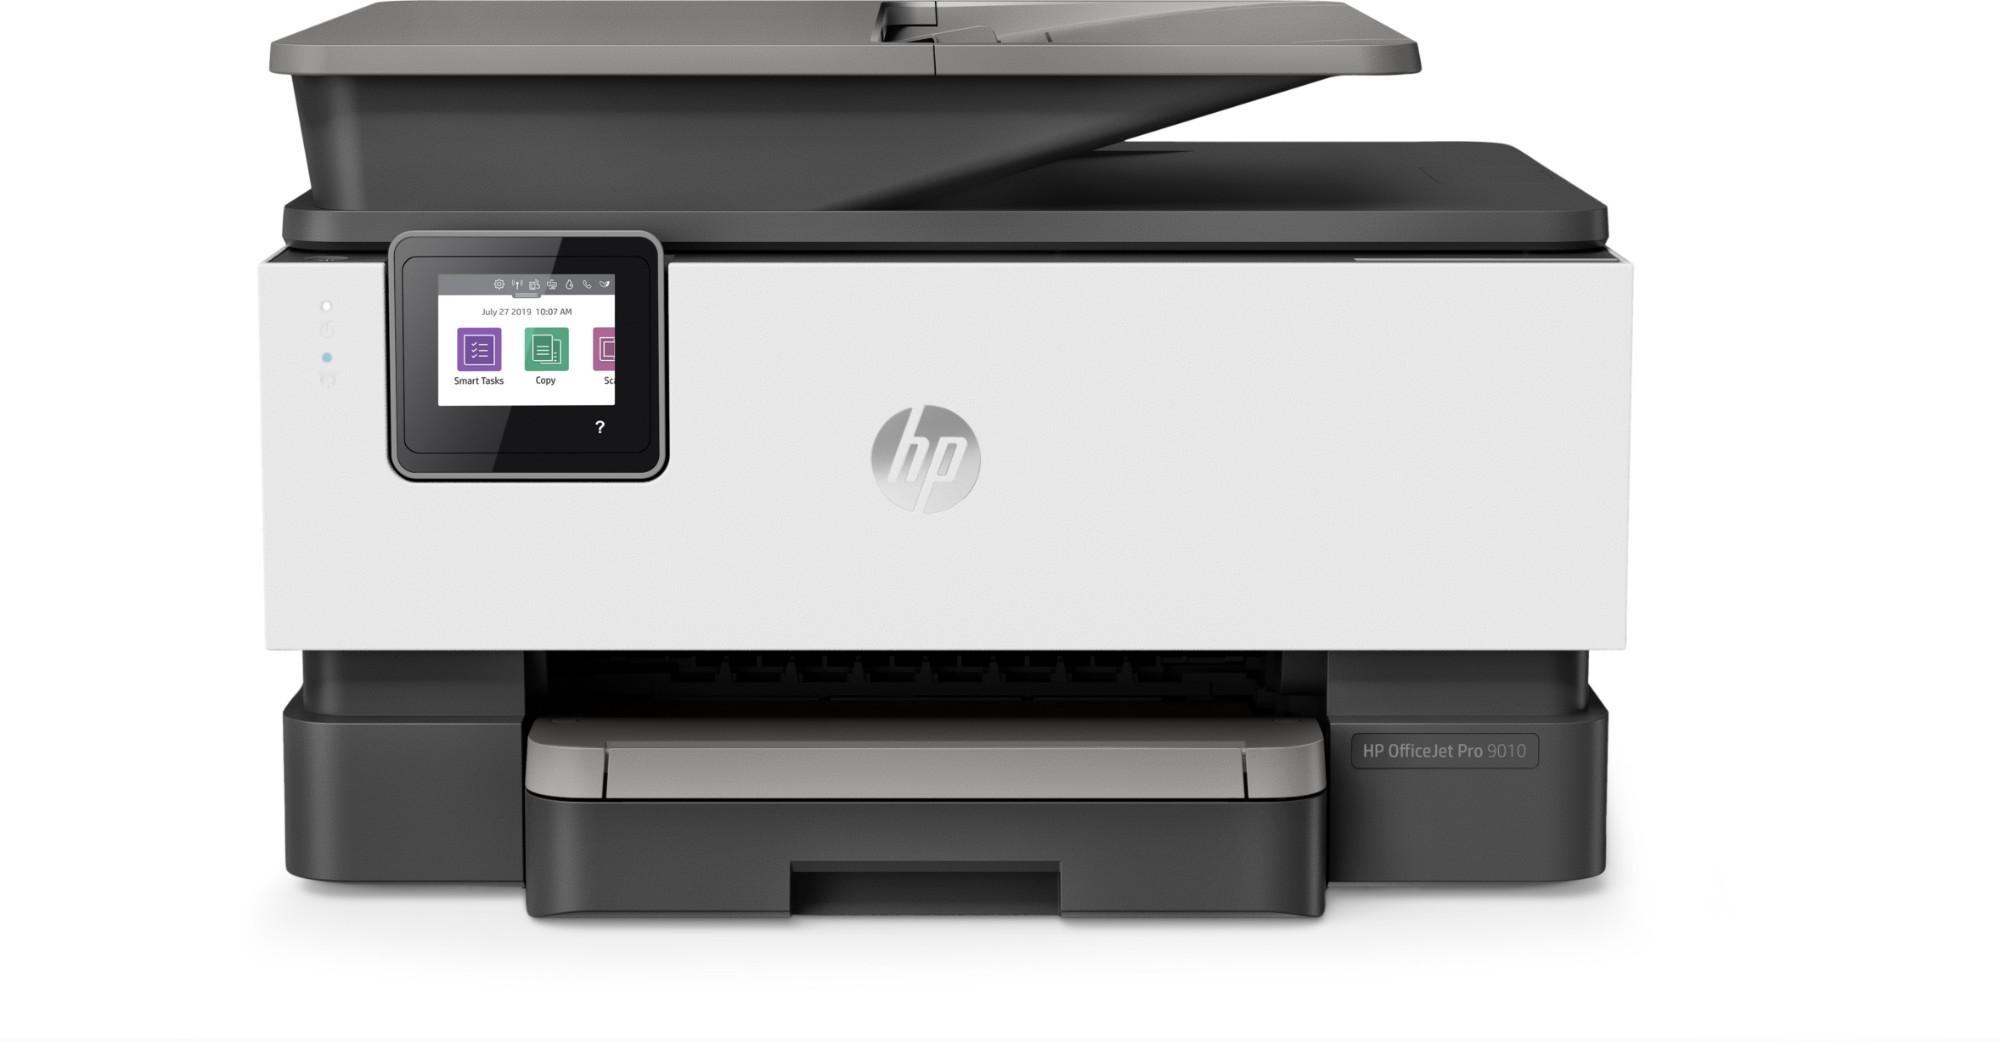 HP OfficeJet Pro 9015 Thermal Inkjet 4800 x 1200 DPI 22 ppm A4 Wi-Fi